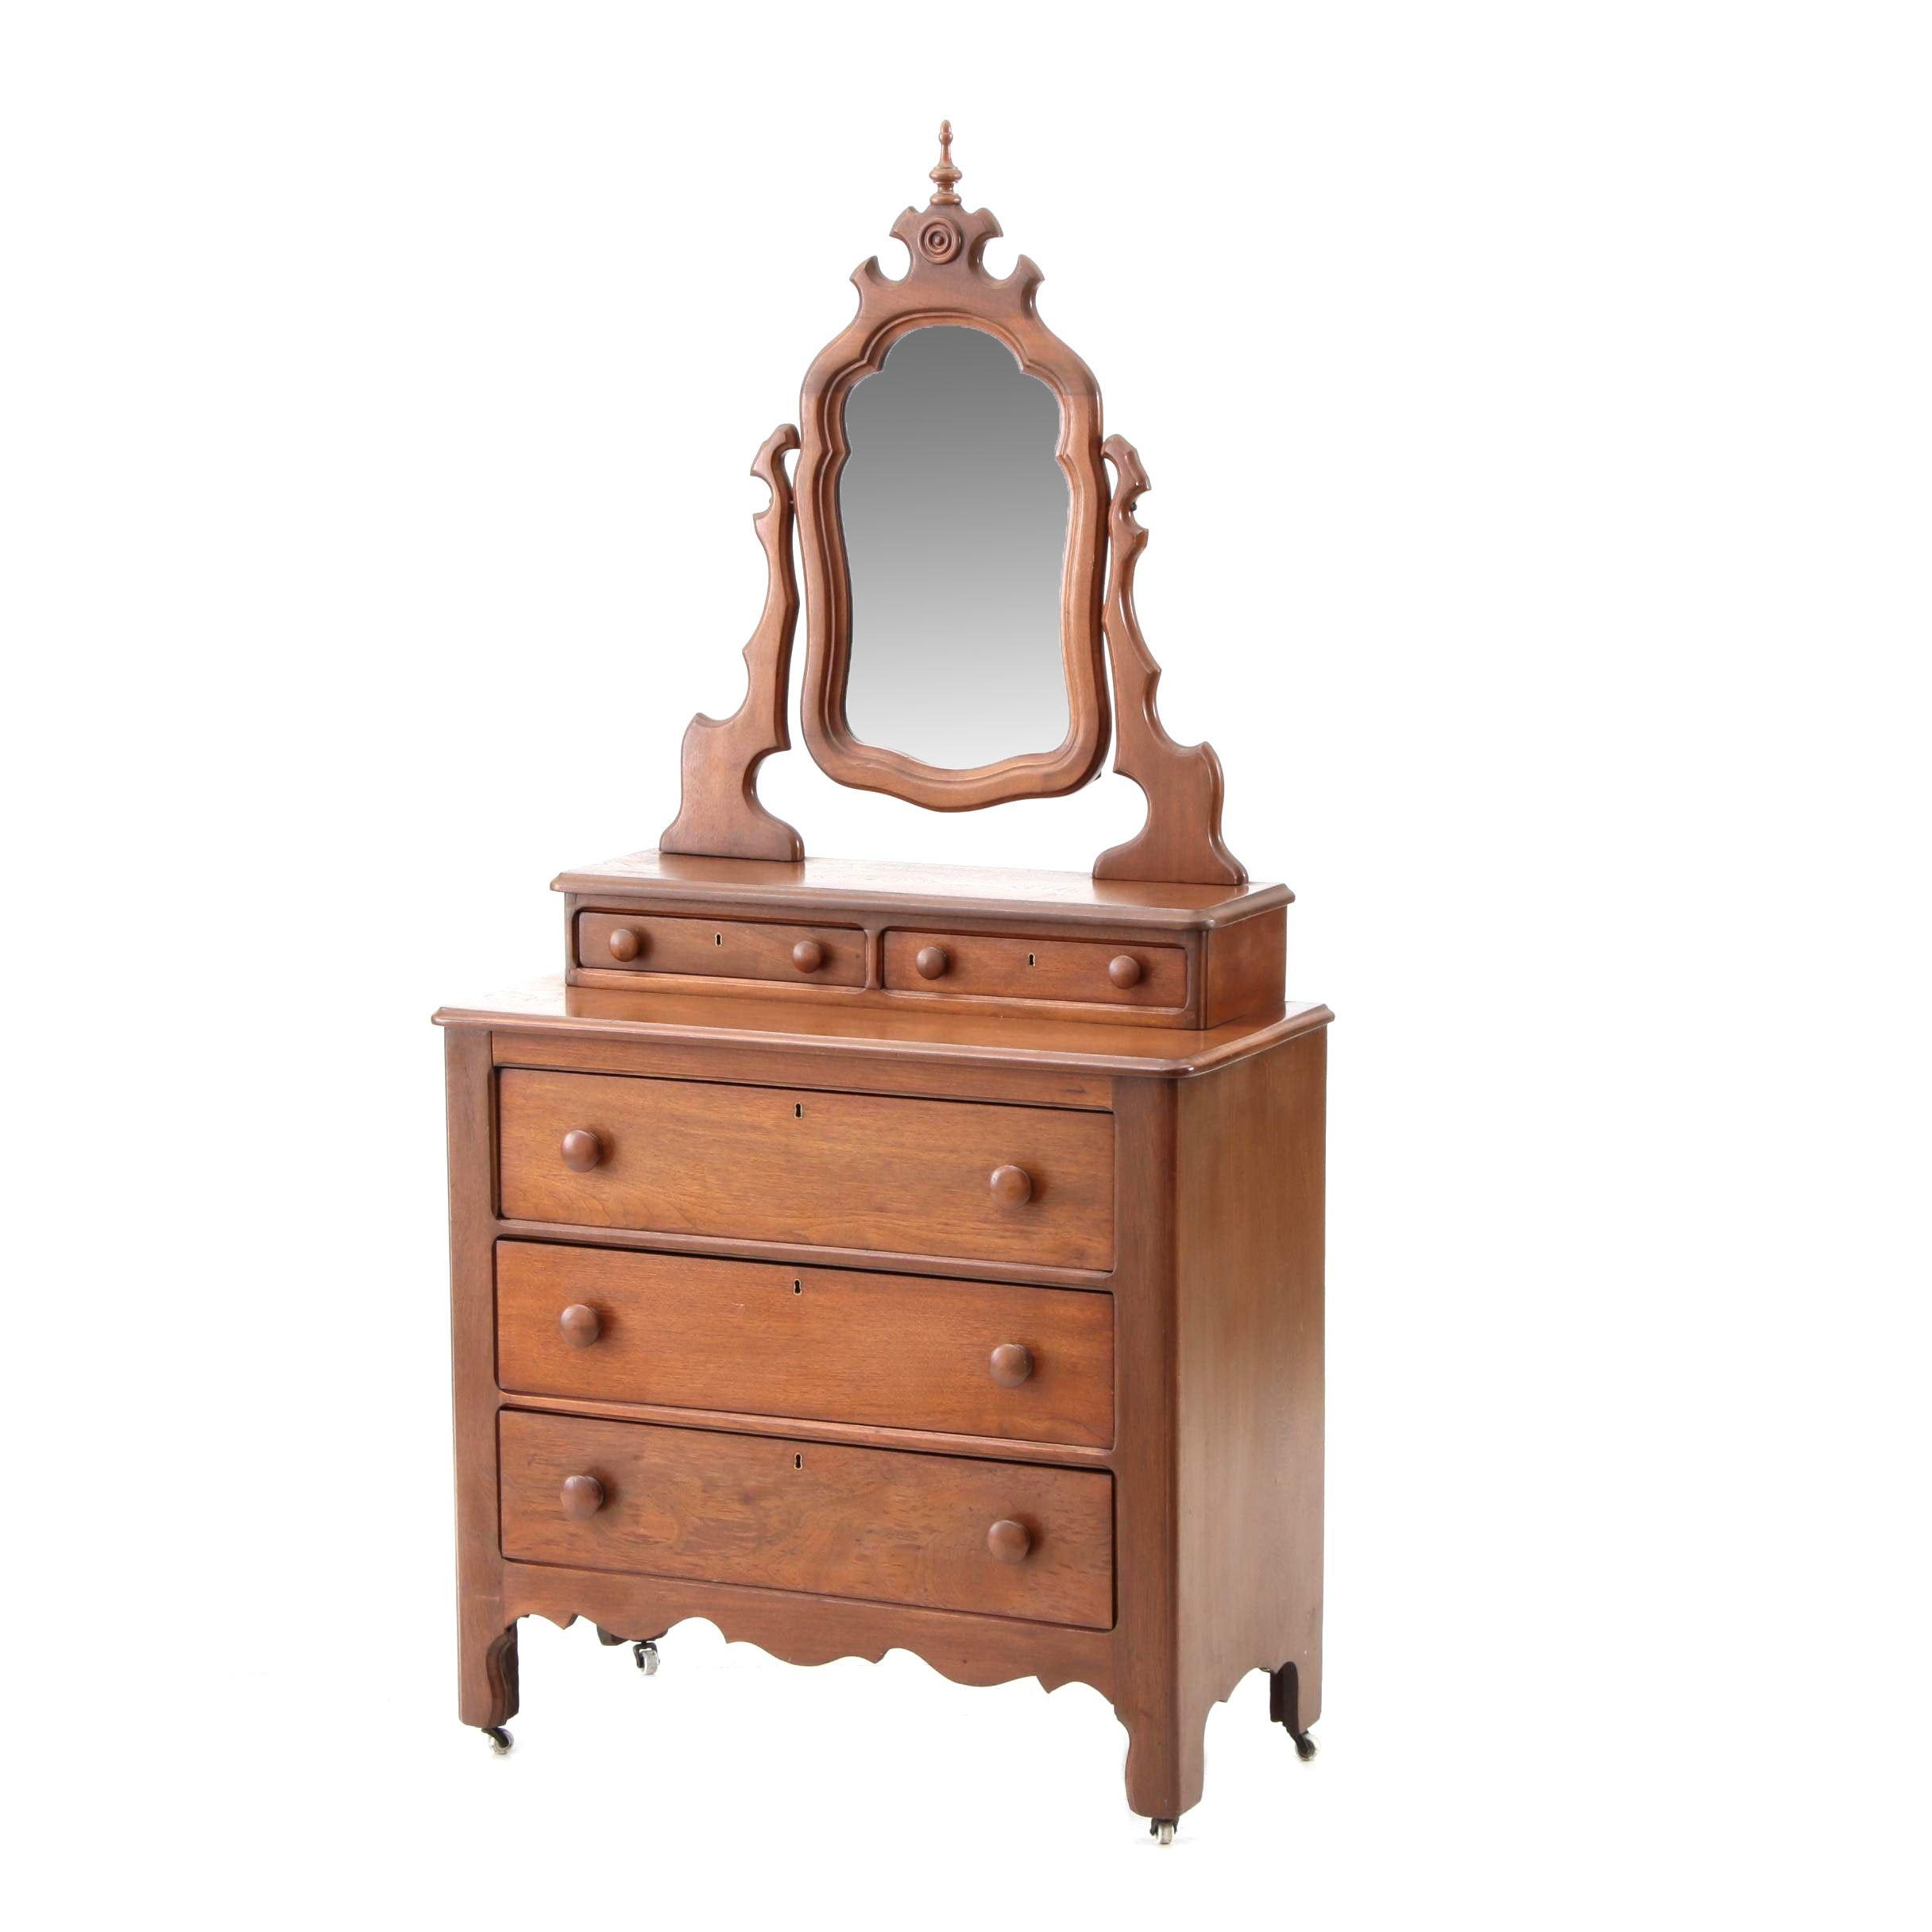 Early 20th-Century Walnut Dresser